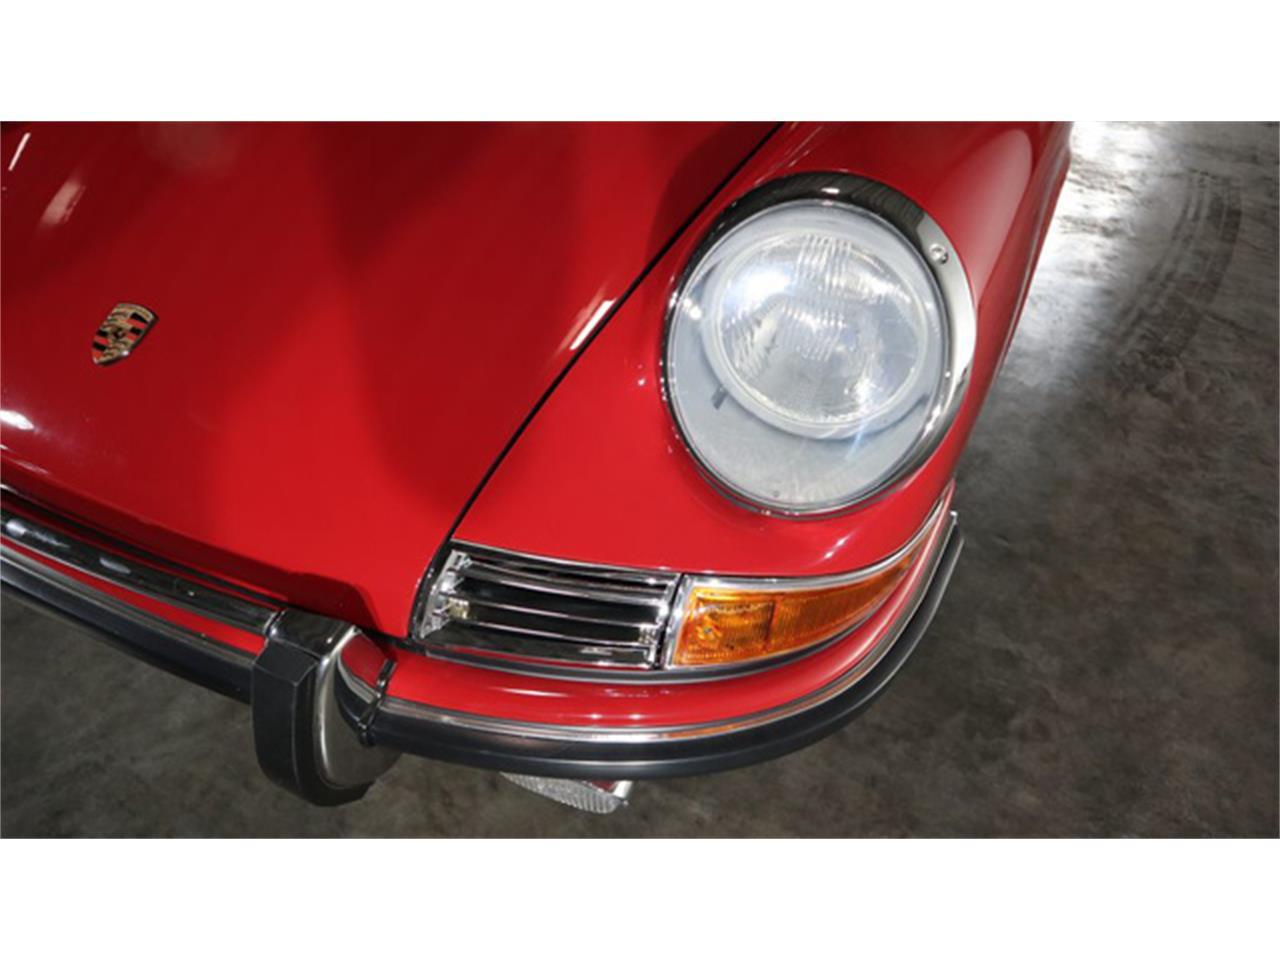 1967 Porsche 911 Carrera S (CC-1386995) for sale in Online, Mississippi